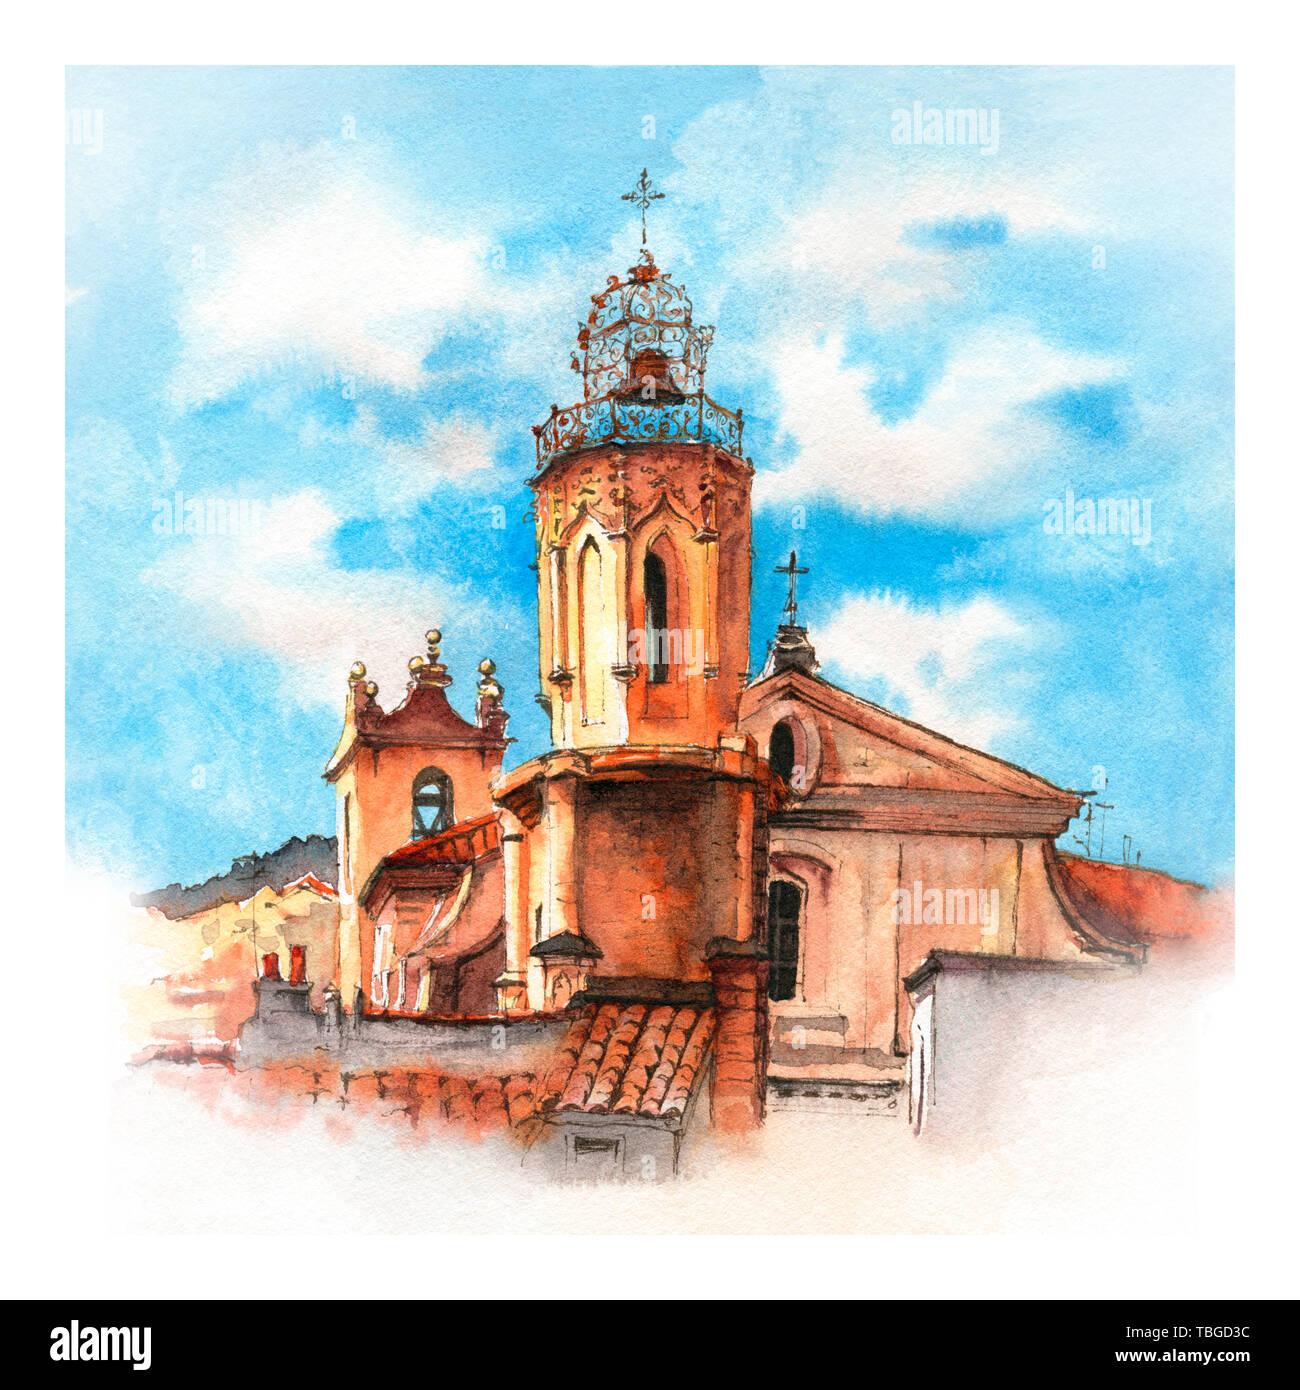 Church in Aix-en-Provence, France Stock Photo